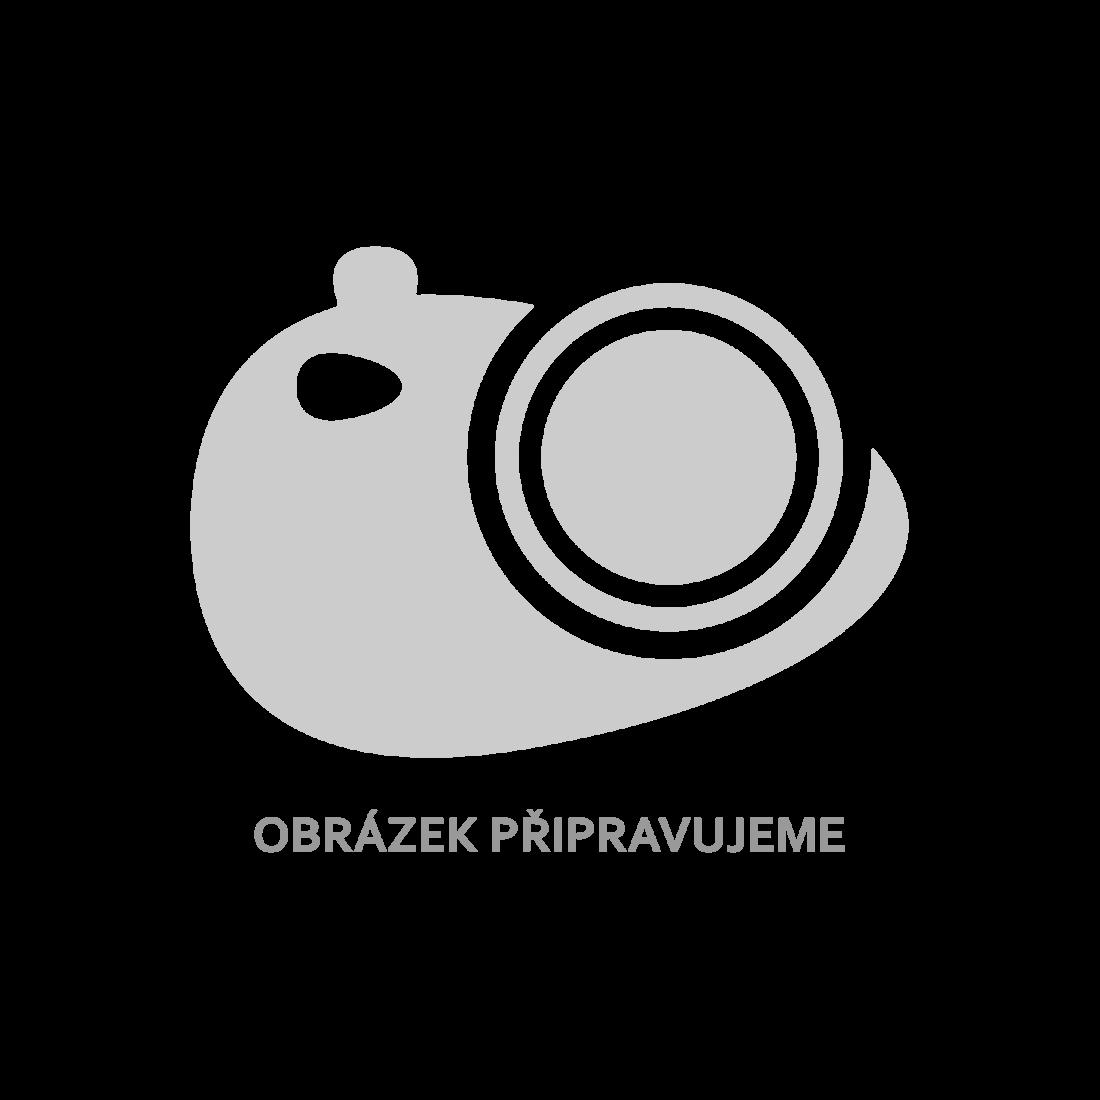 3 čtvercové úložné boxy z MDF betonově šedé